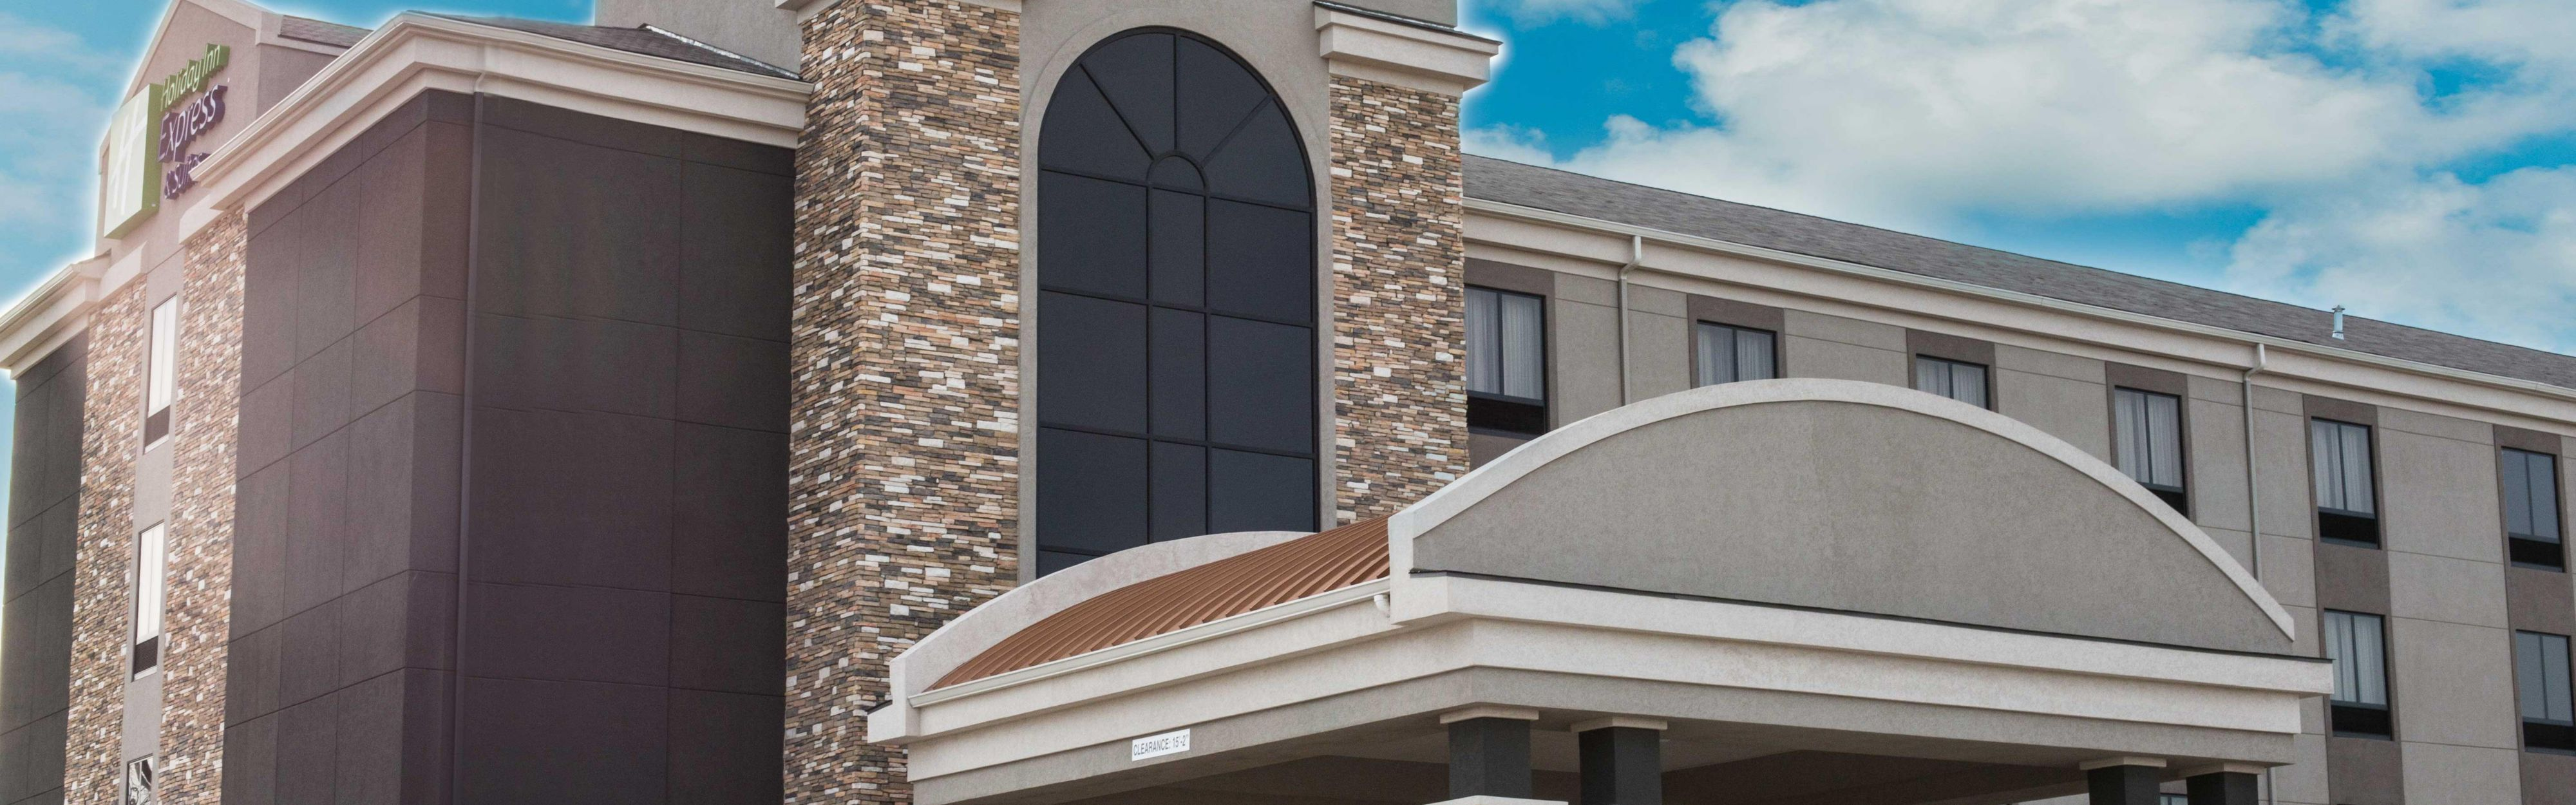 Holiday Inn Express & Suites Oklahoma City Southeast - I-35 image 0